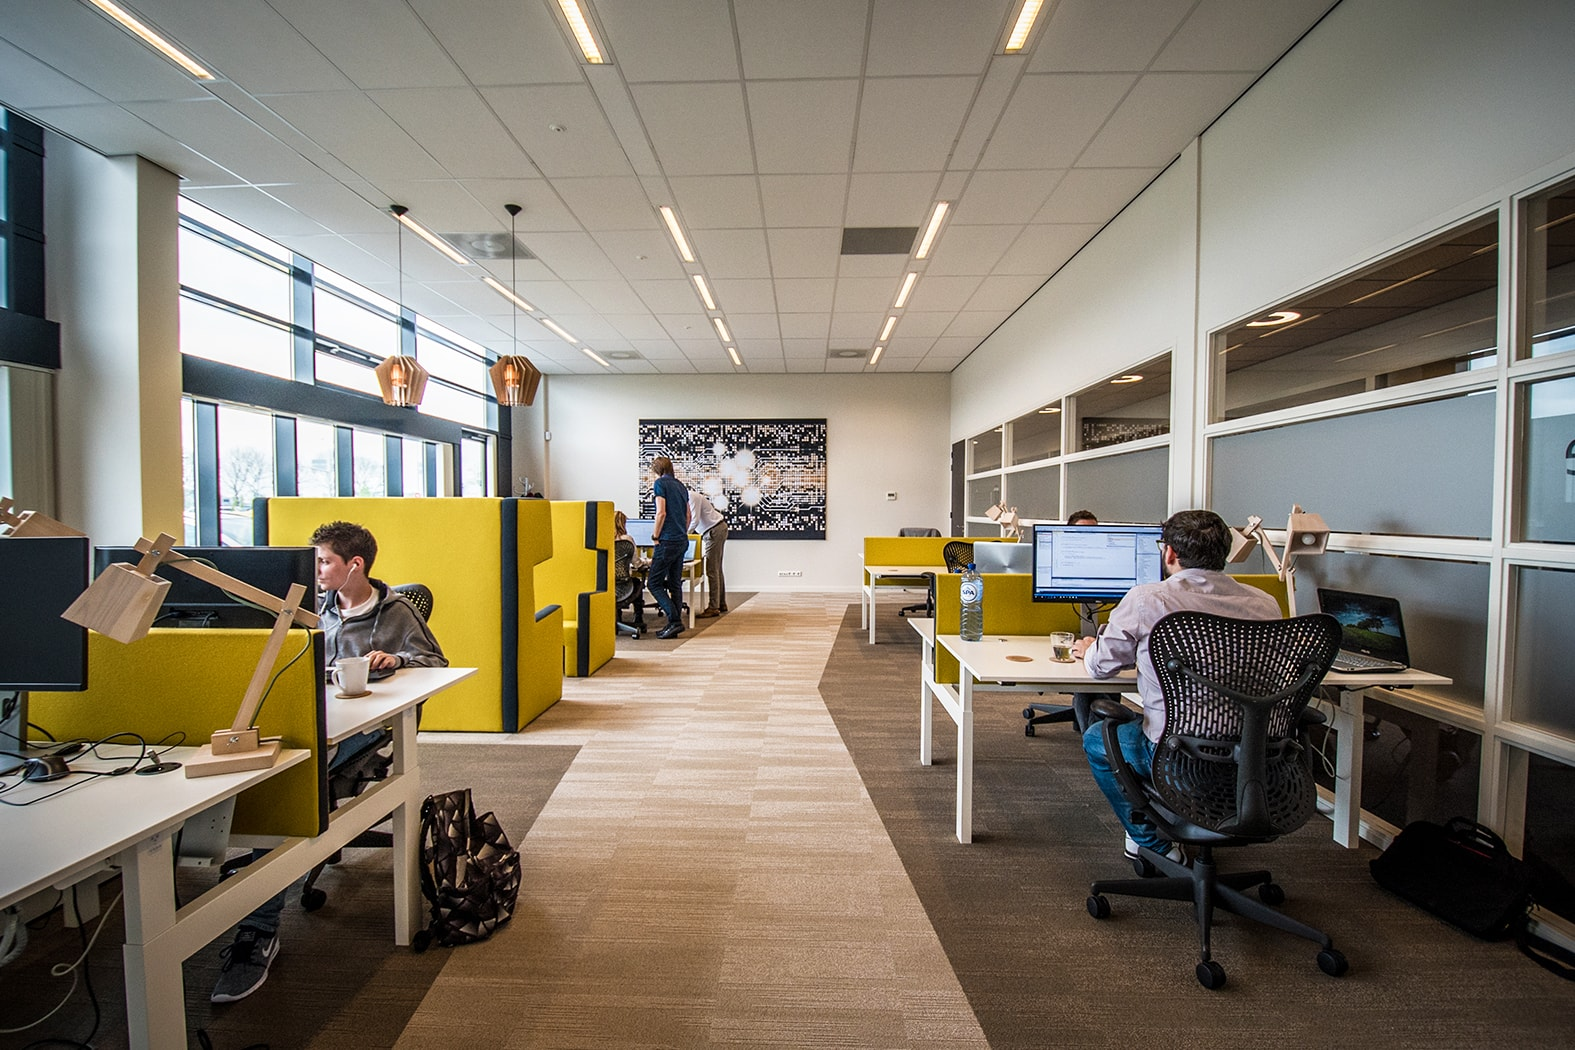 Alphen aan den Rijn Kantoorruimte Huren | Crown Business Center Alphen